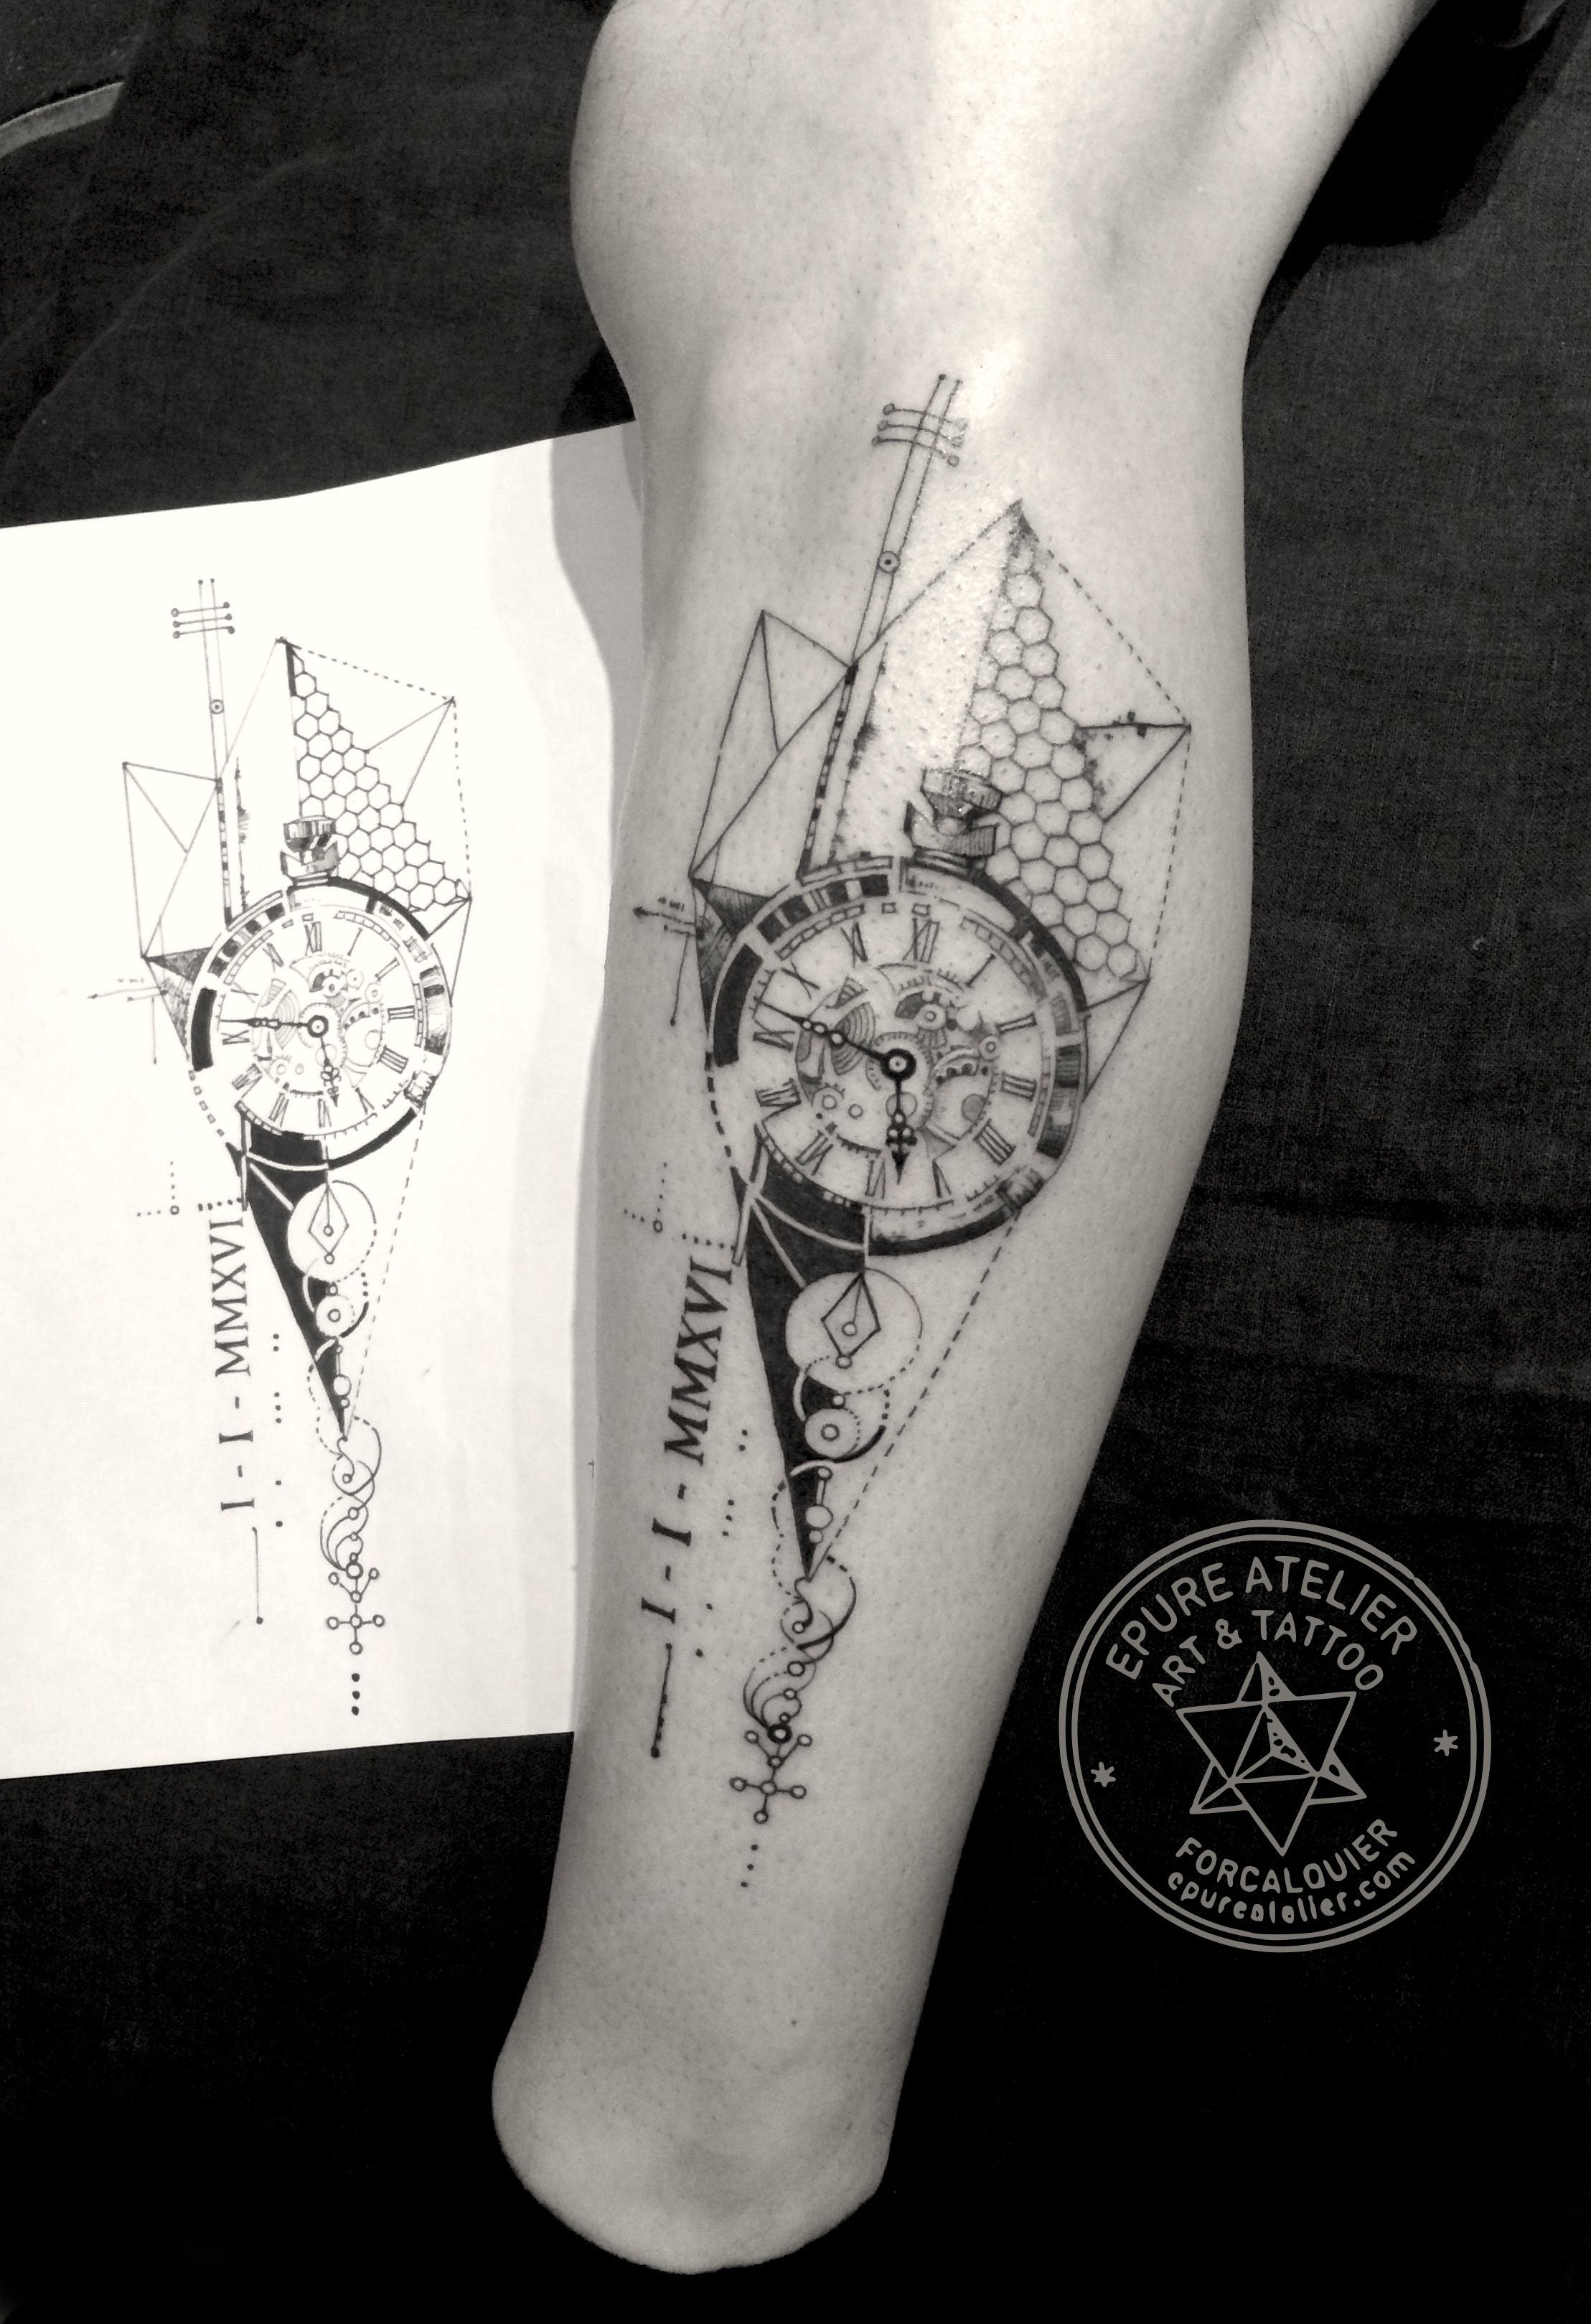 img 9286 2 couture ideias de tatuagens tatuagem masculina et tatuagens geom tricas. Black Bedroom Furniture Sets. Home Design Ideas